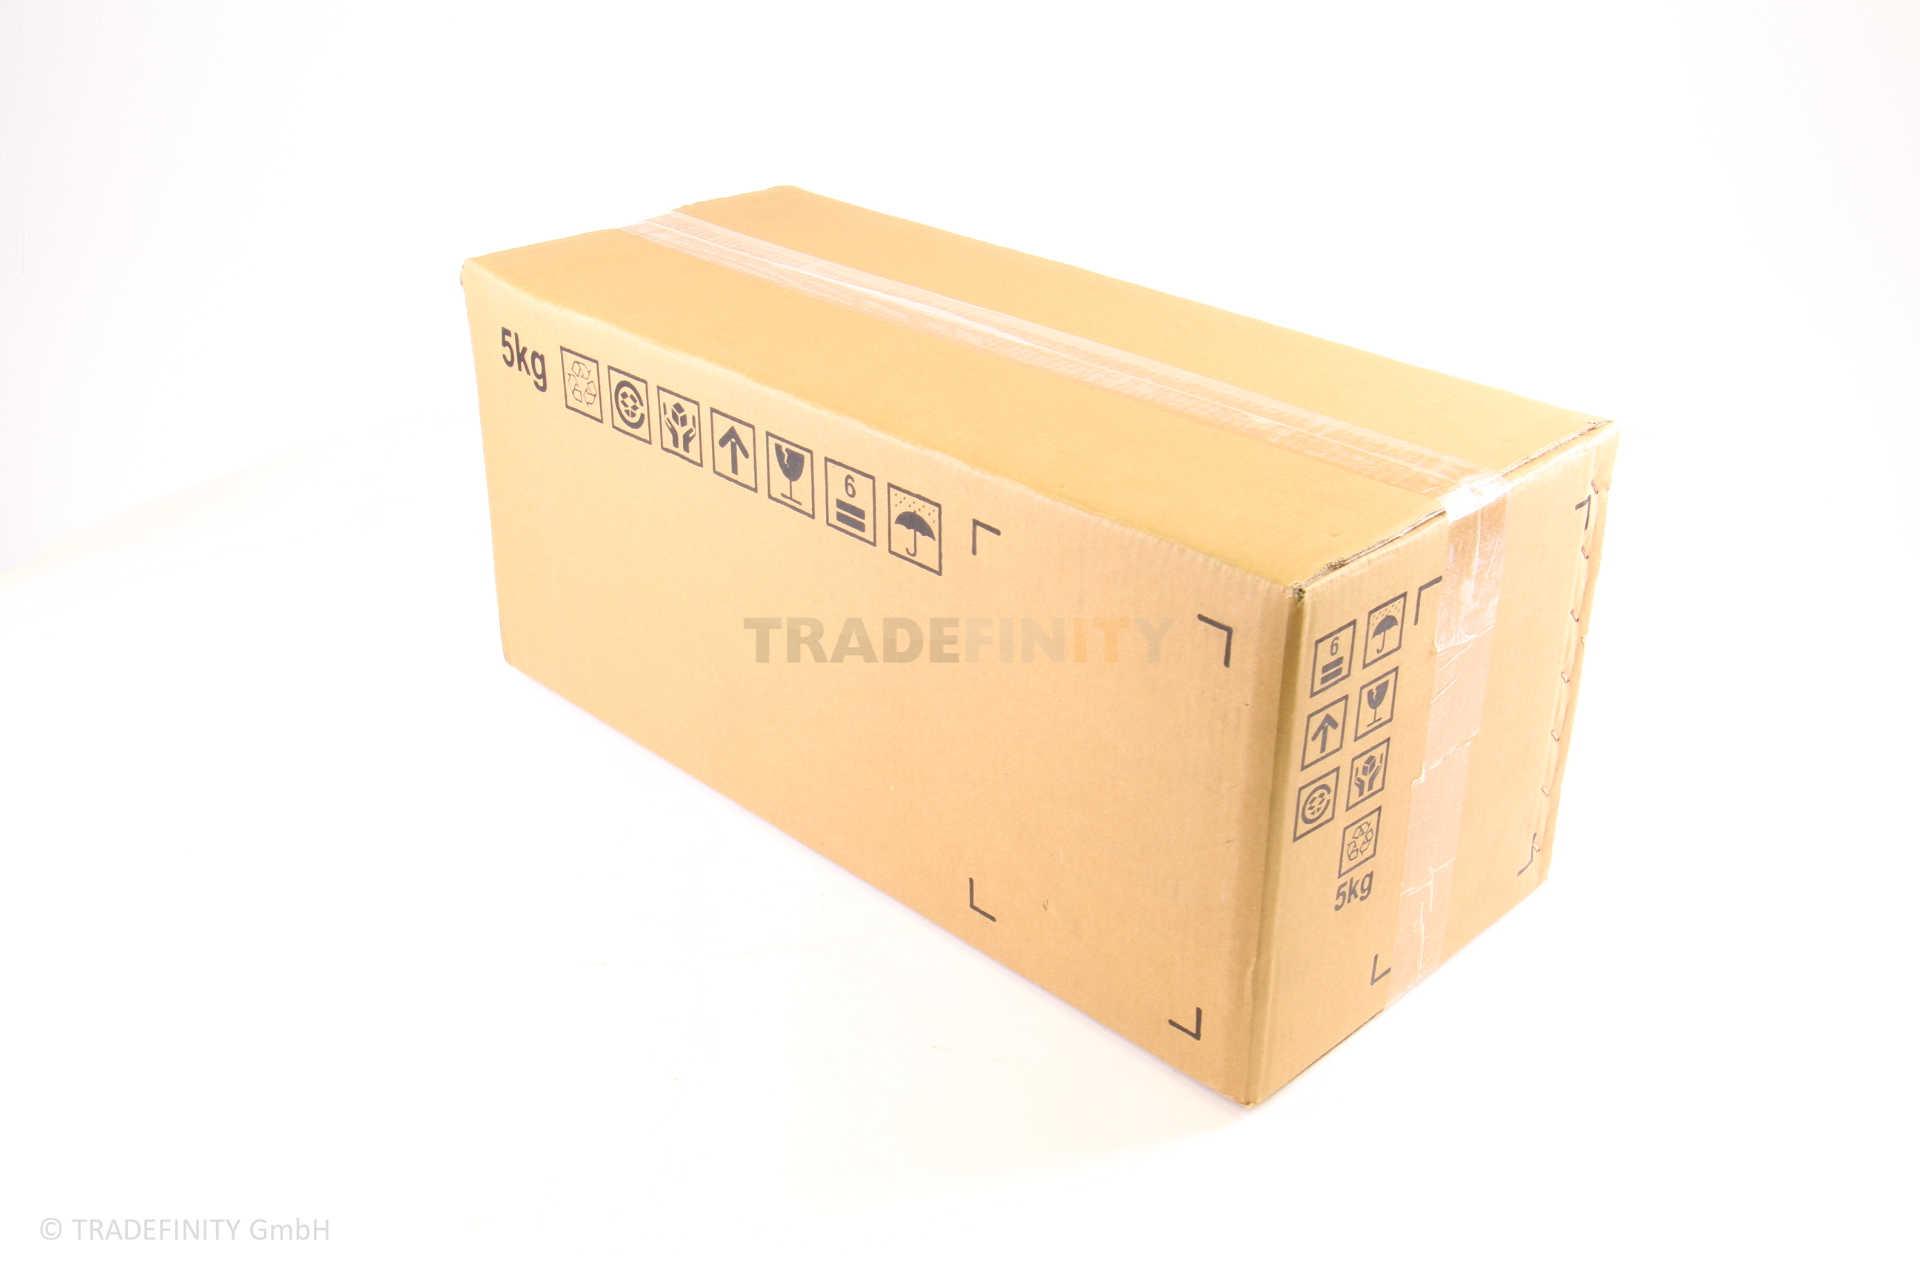 ColorQube 9201/9202/9203/9301/9302/9303, AltaLink B8000, High Volume Finisher